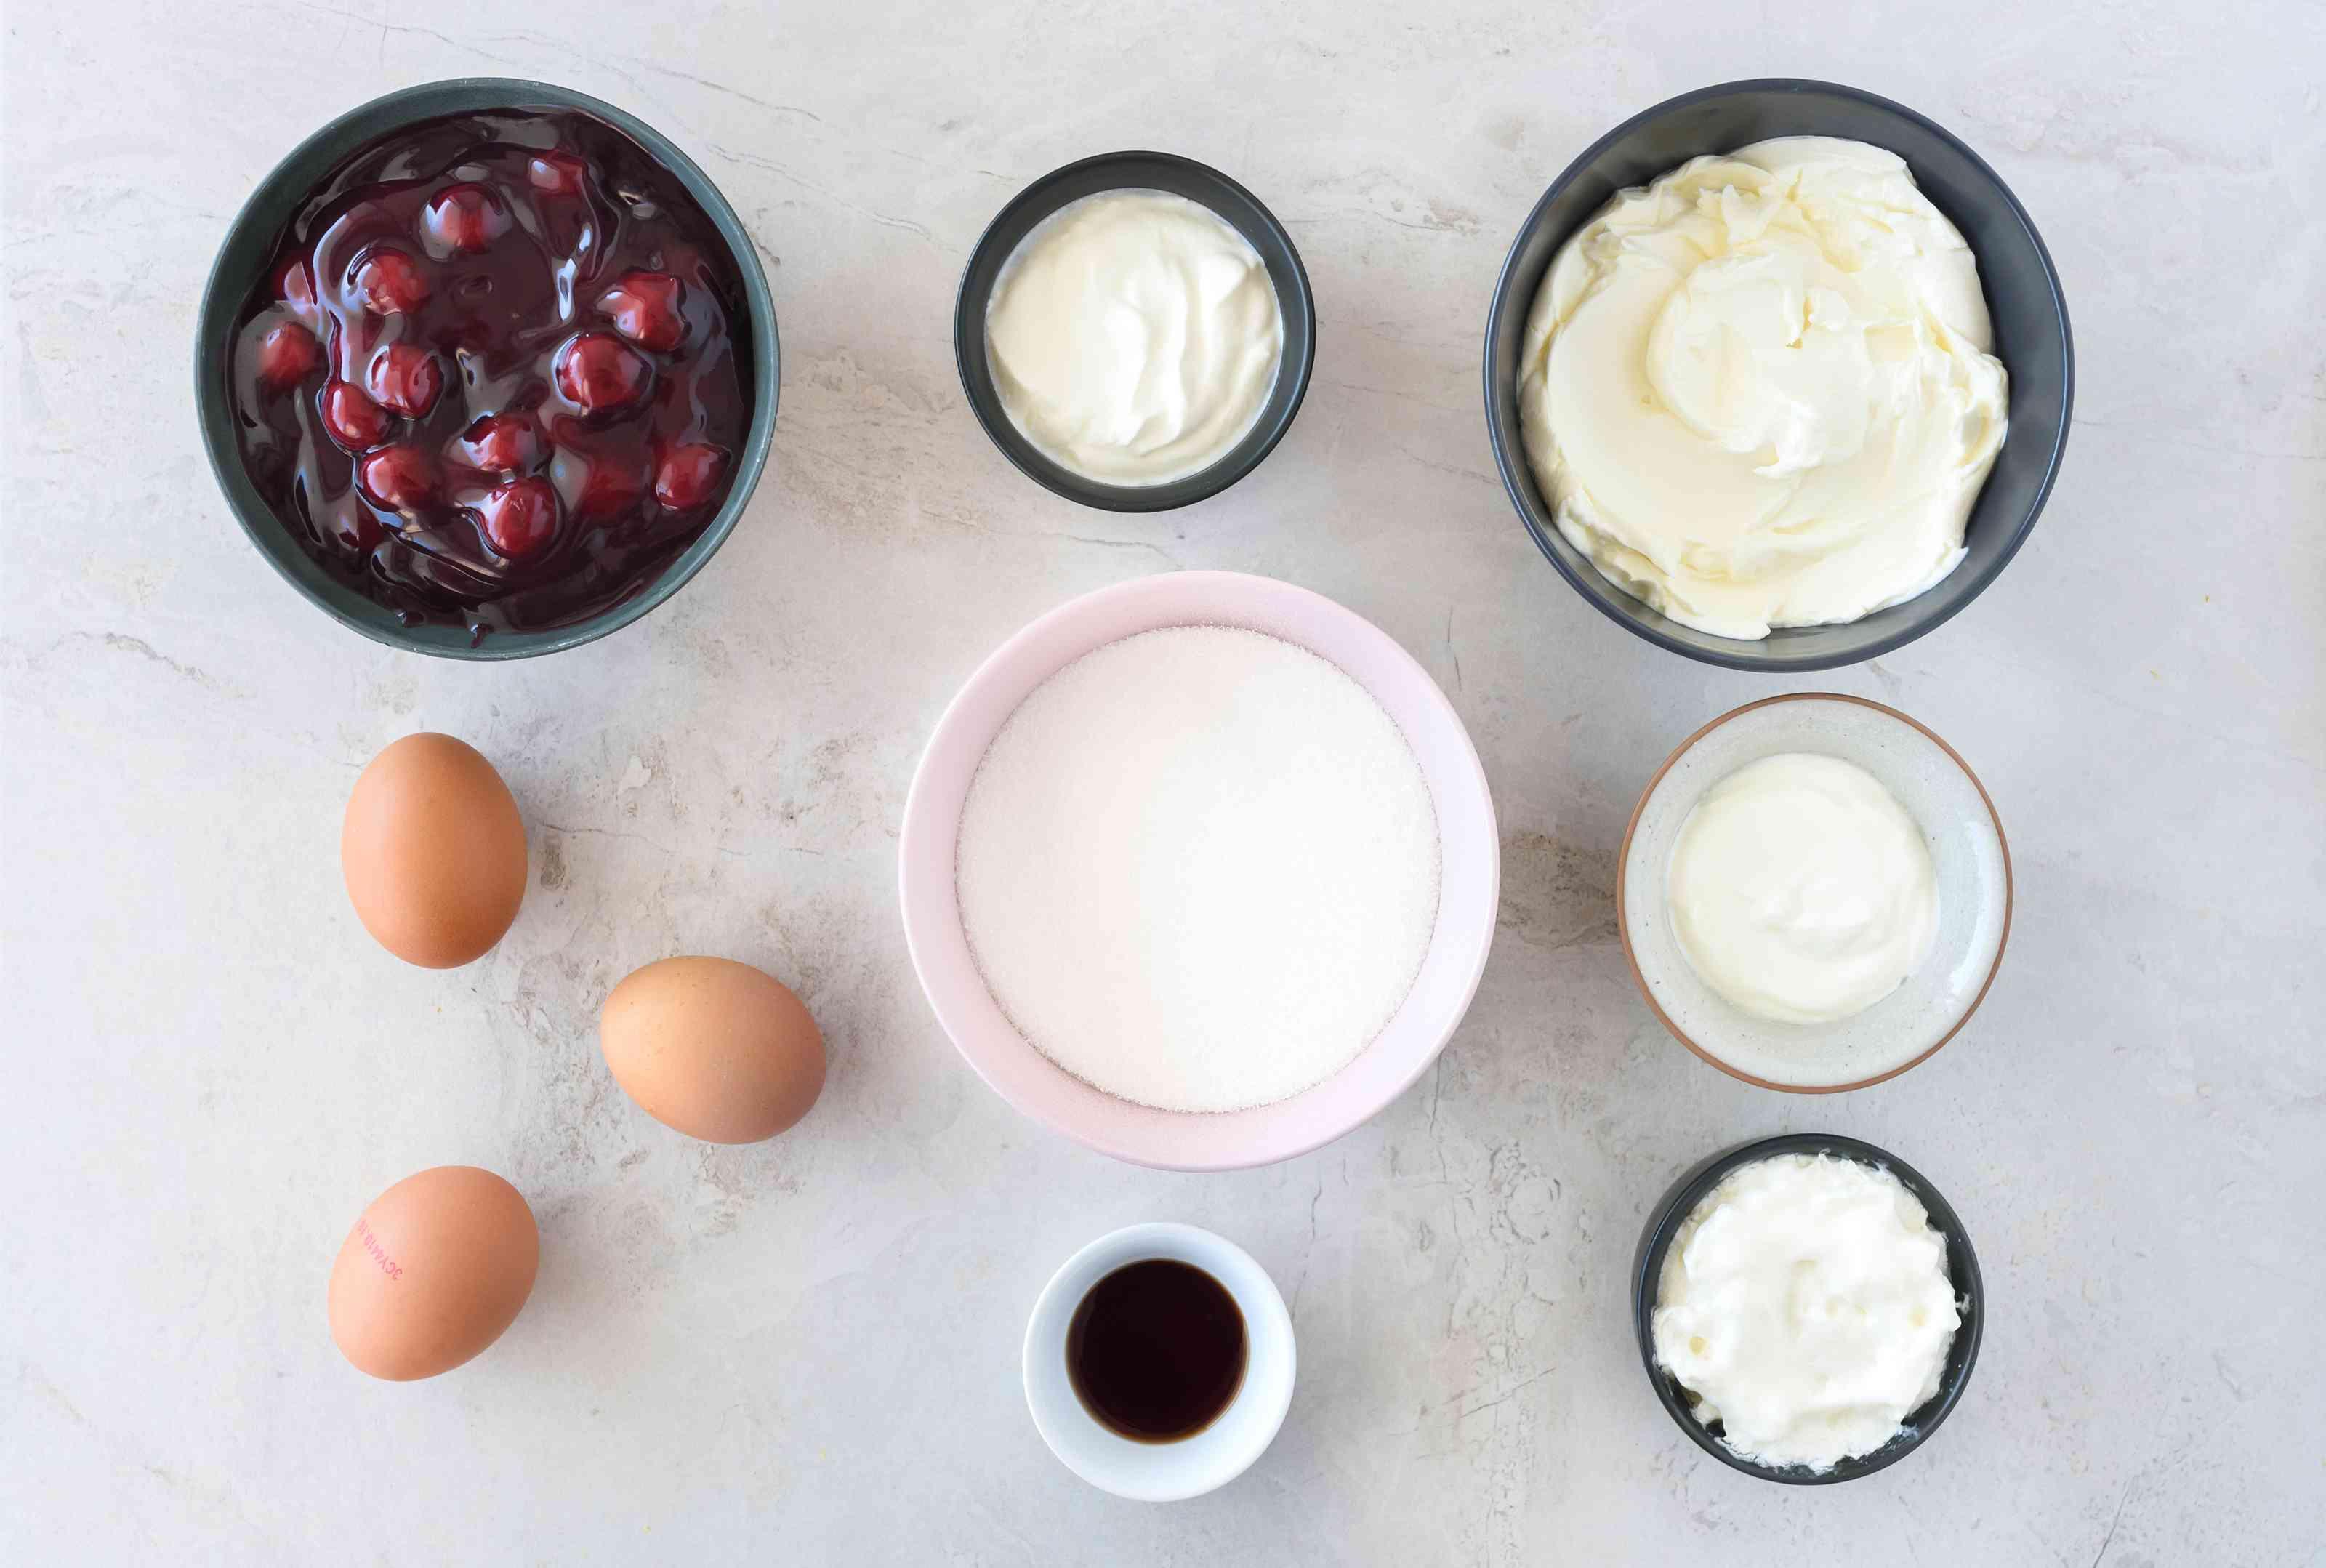 Dairy-free cherry cheesecake ingredients